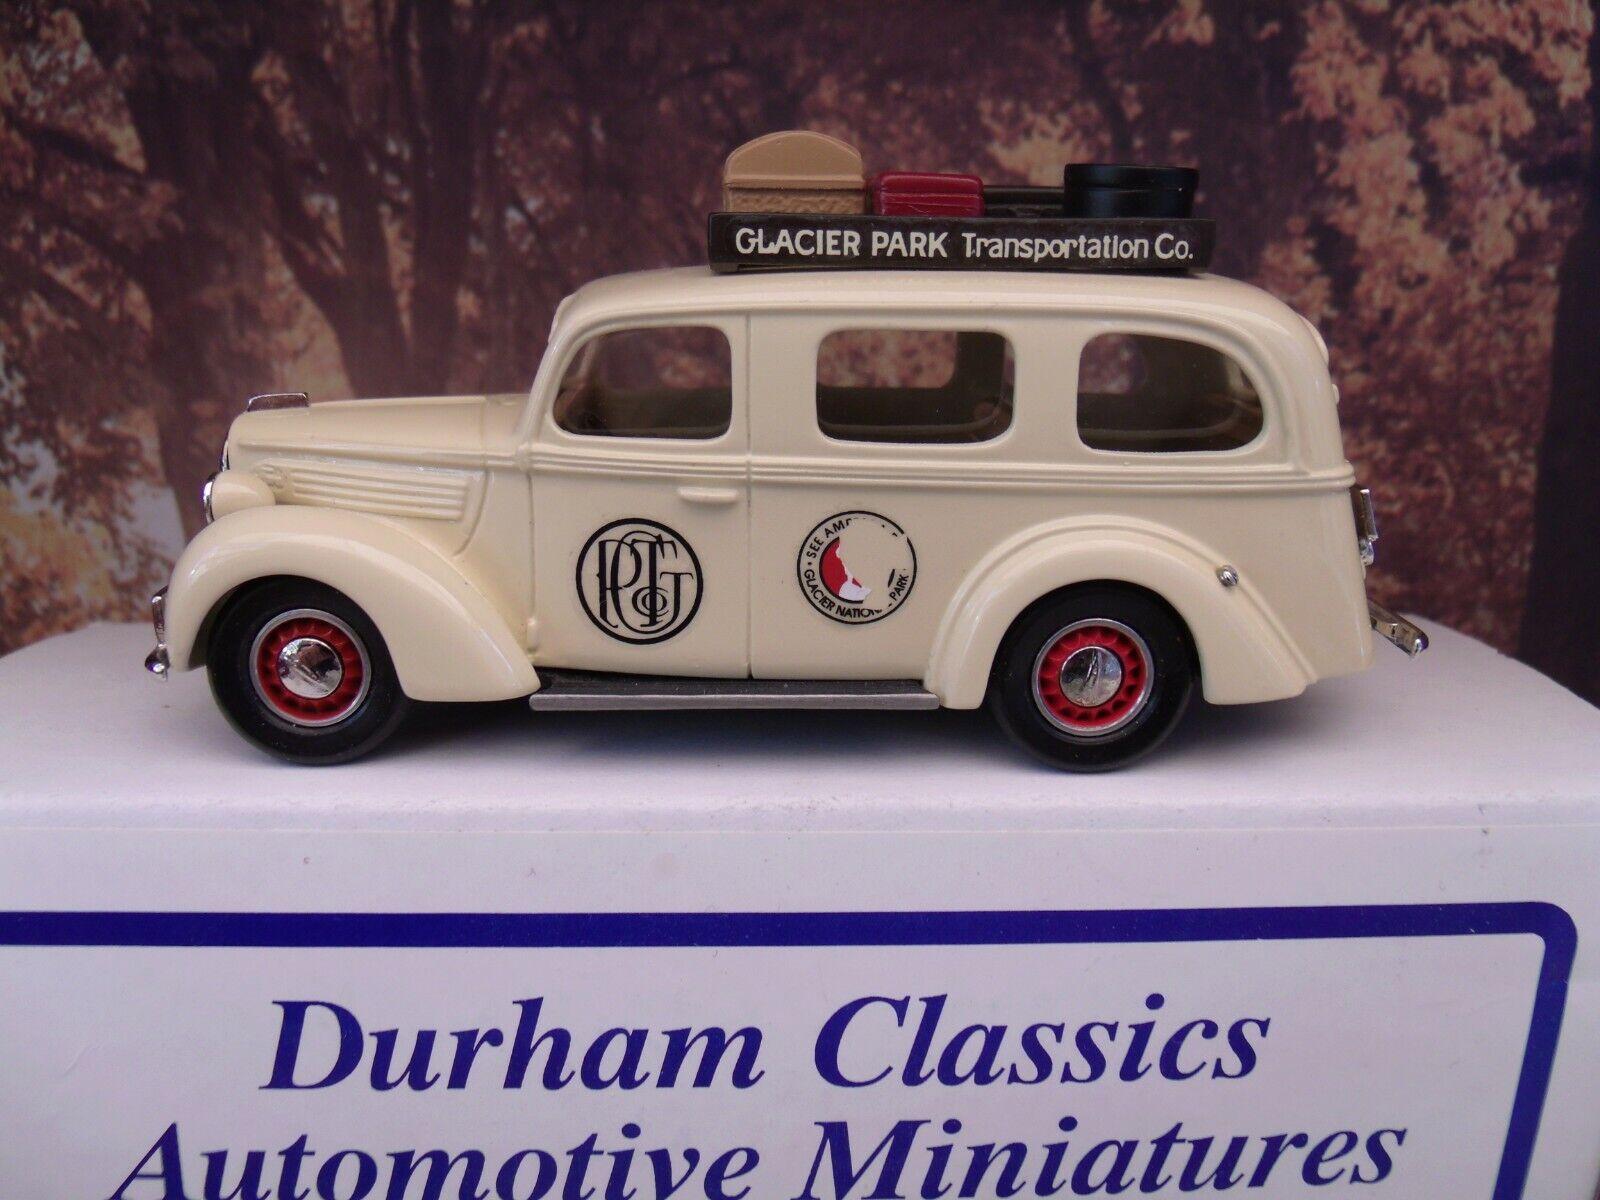 1 43  Durham classics Ford 1939 Tour Bus  Glacier transportation company 1914